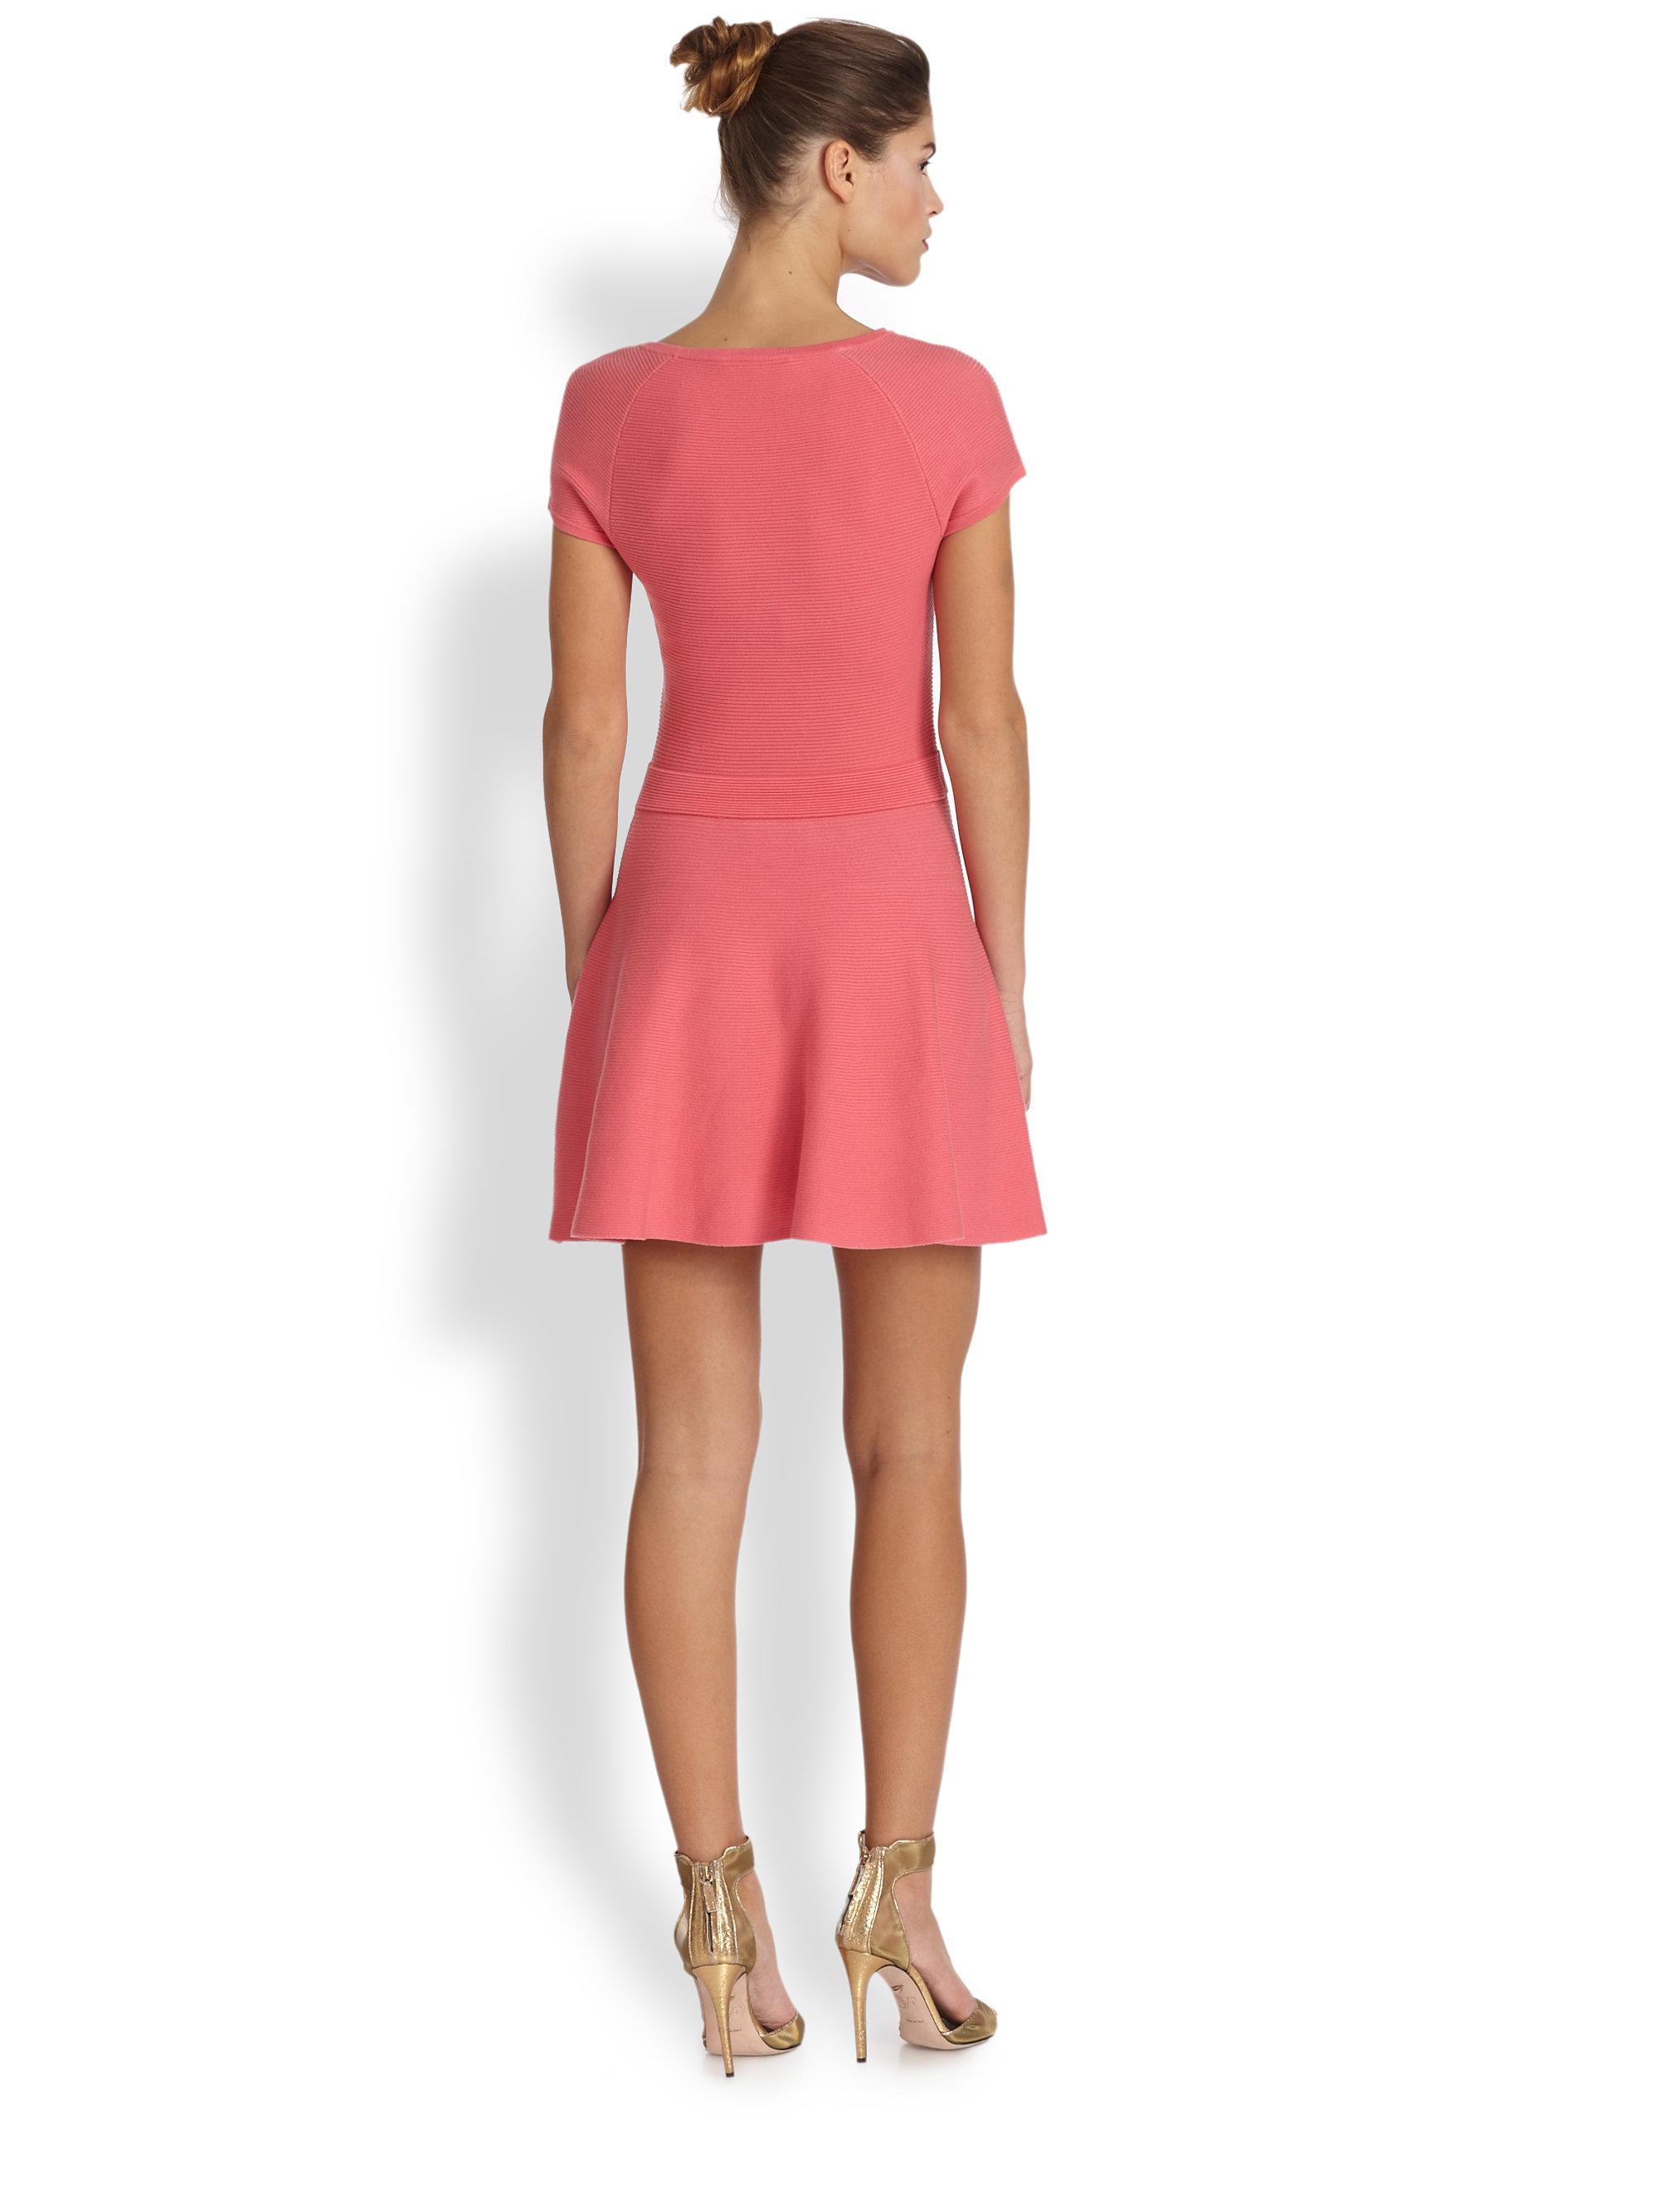 Lyst Trina Turk Cozumel Dress In Pink